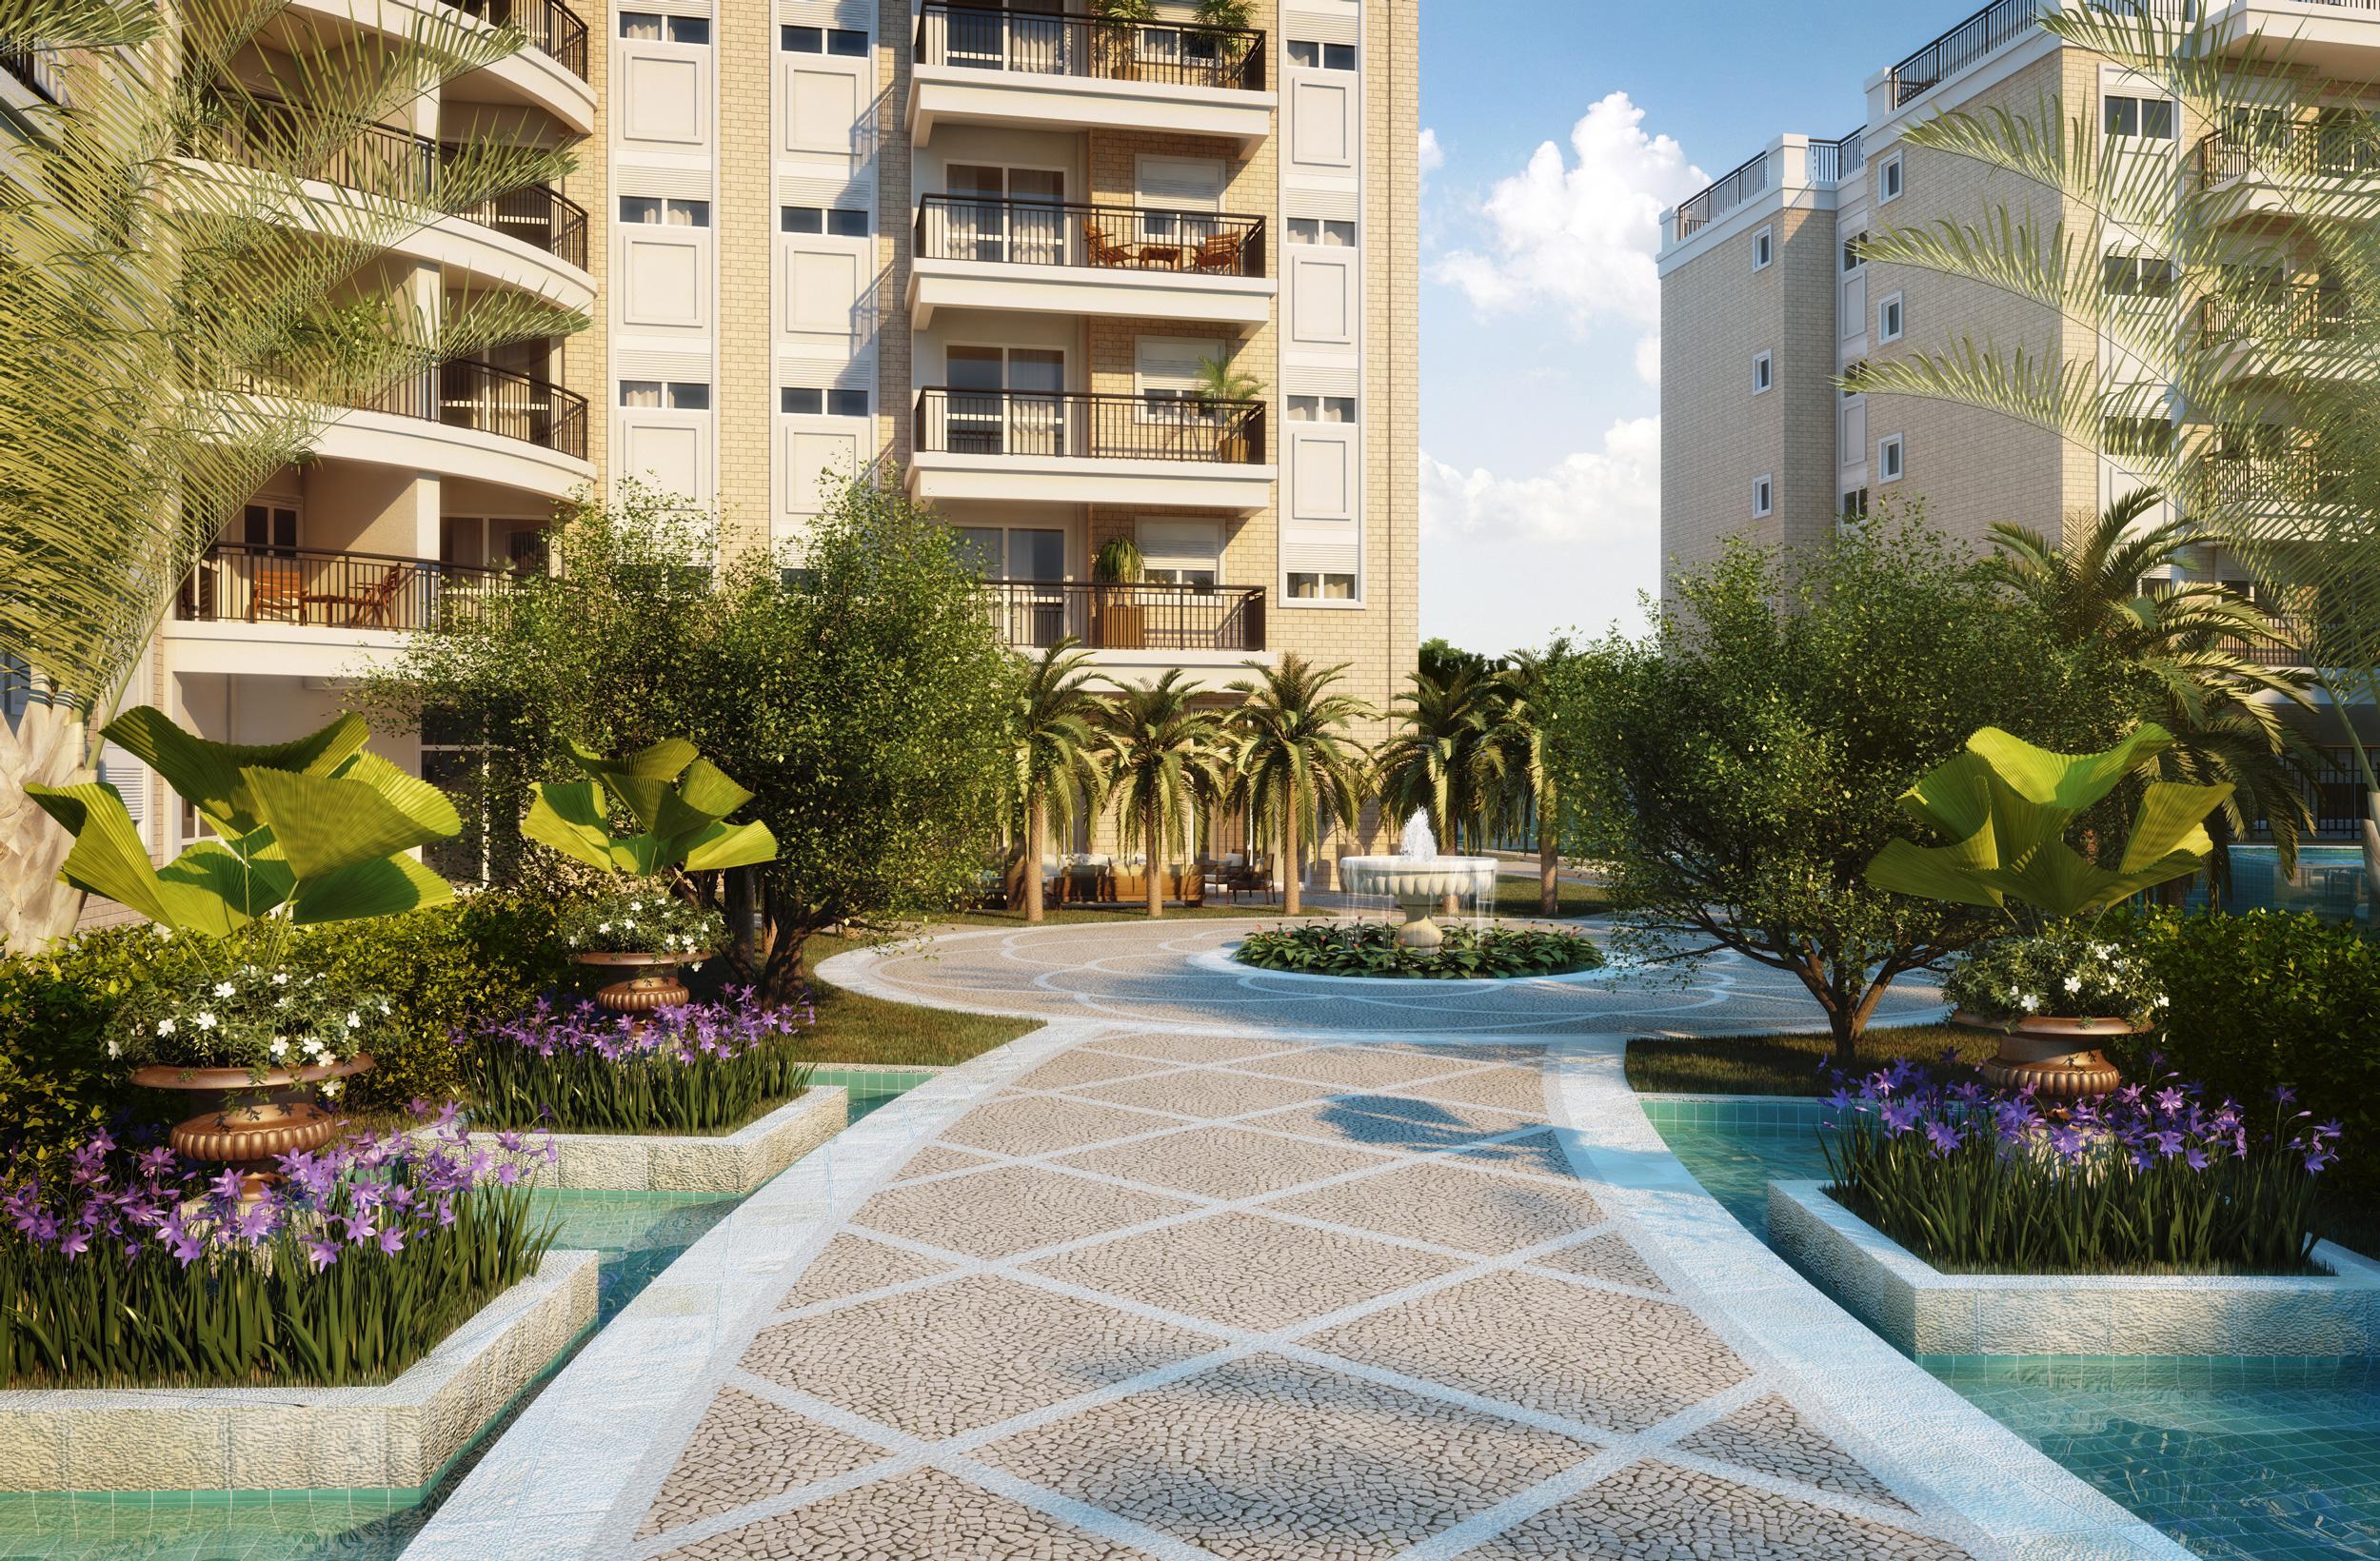 Área Comum | Andalus by Cyrela – Apartamentono  Morumbi - São Paulo - São Paulo